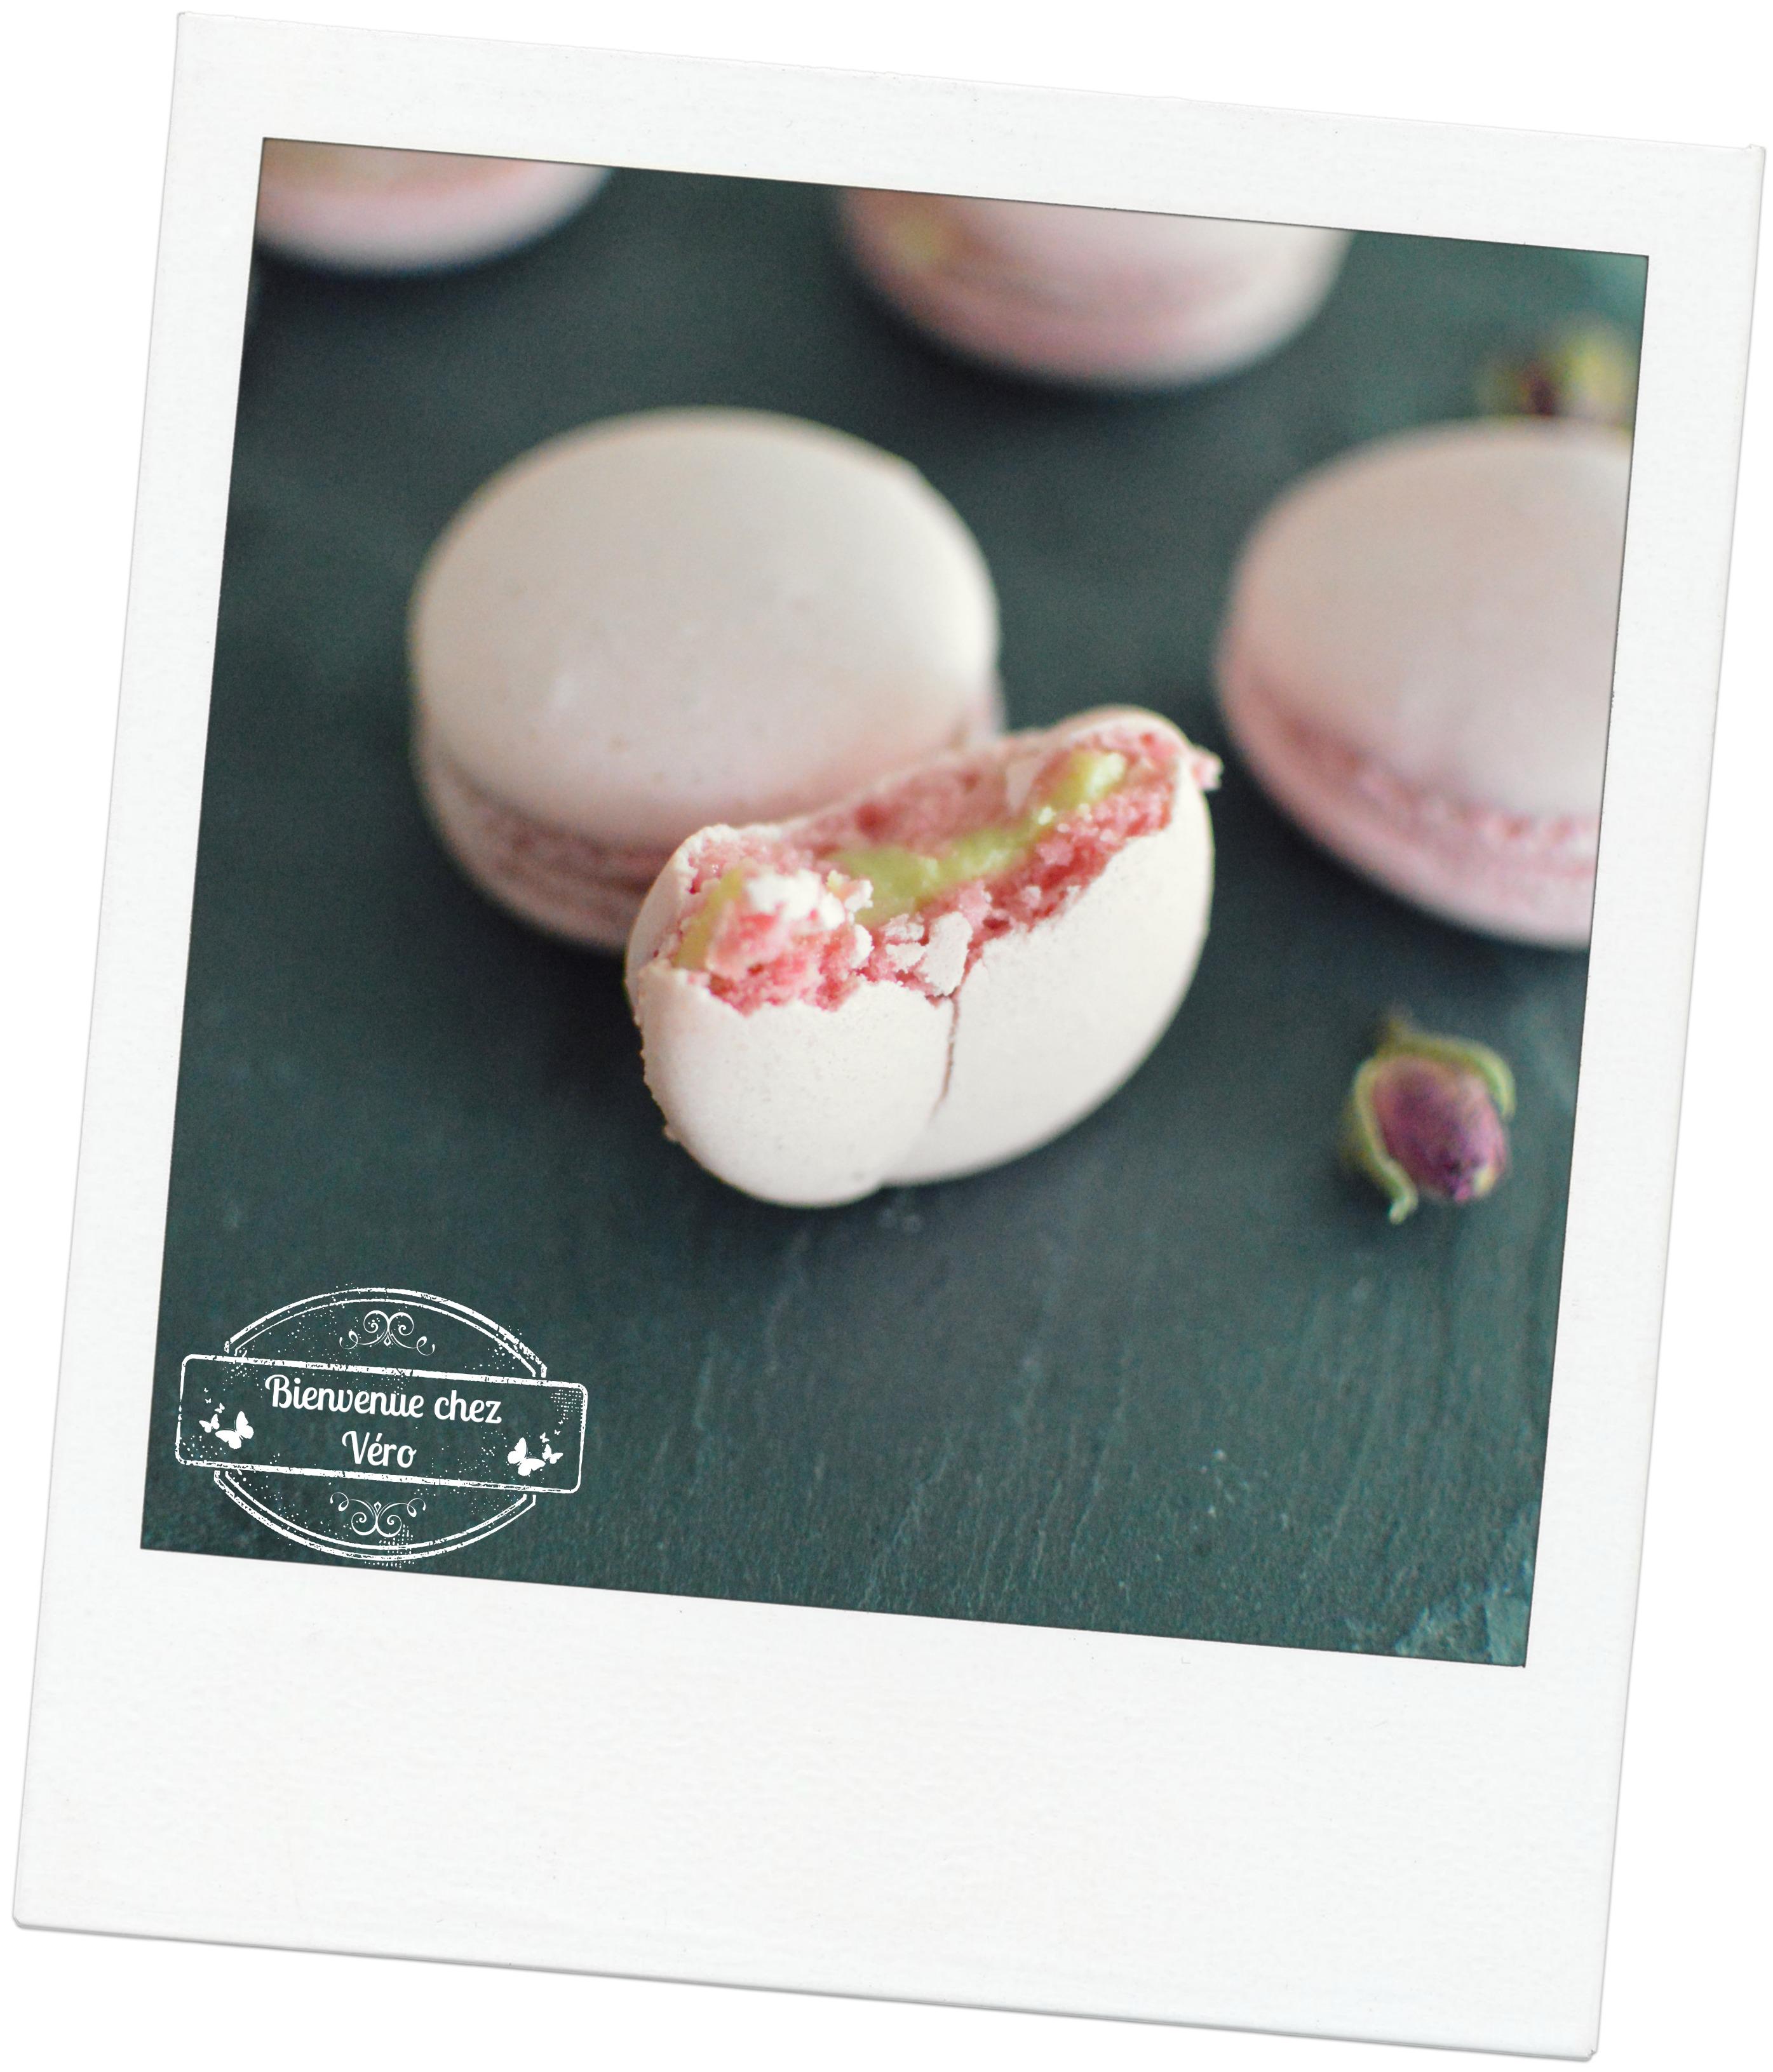 DSC_3666 macarons